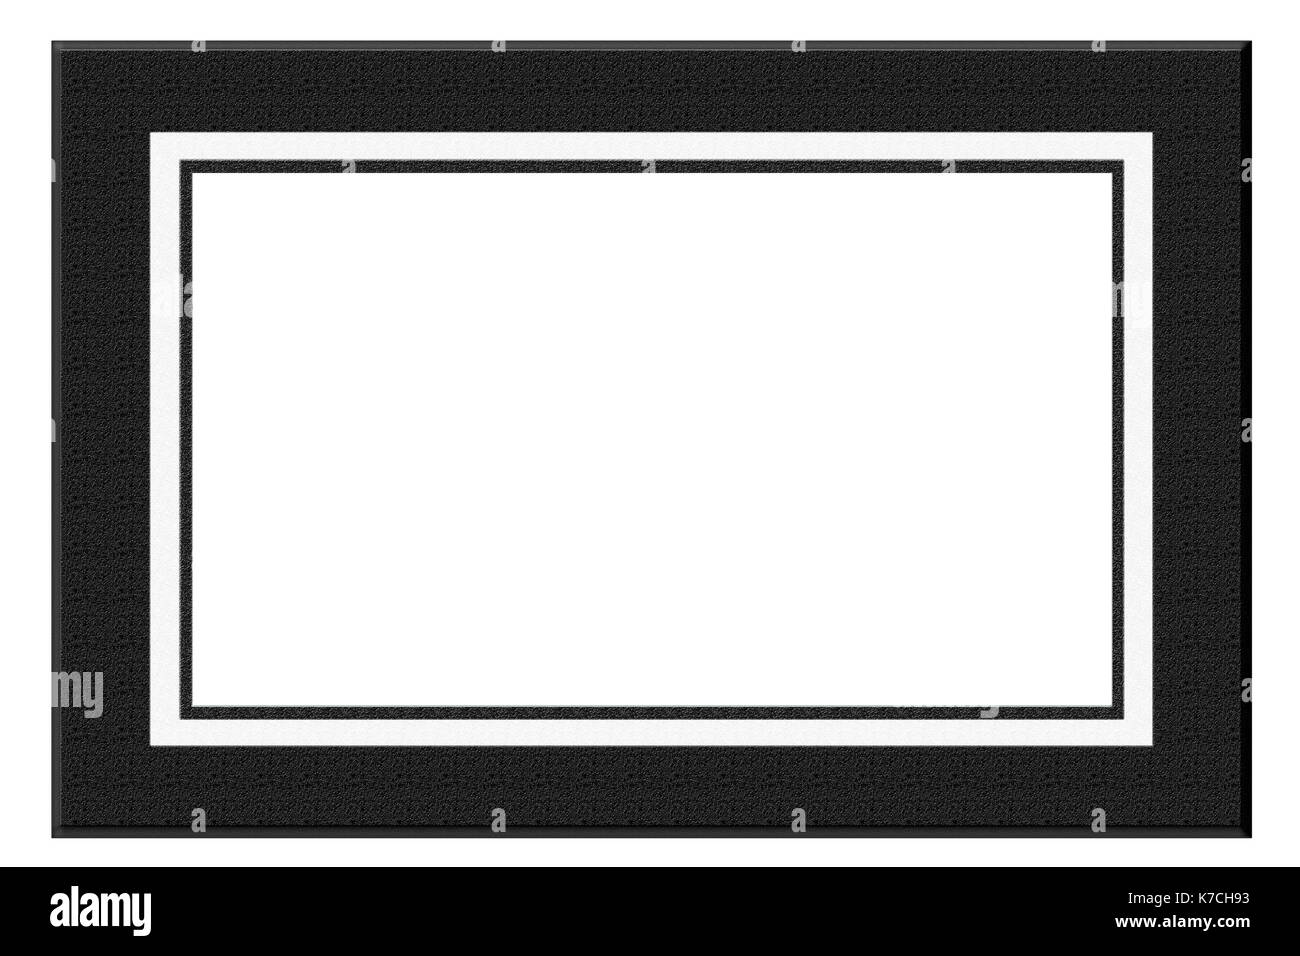 Black Frames Stockfotos & Black Frames Bilder - Alamy